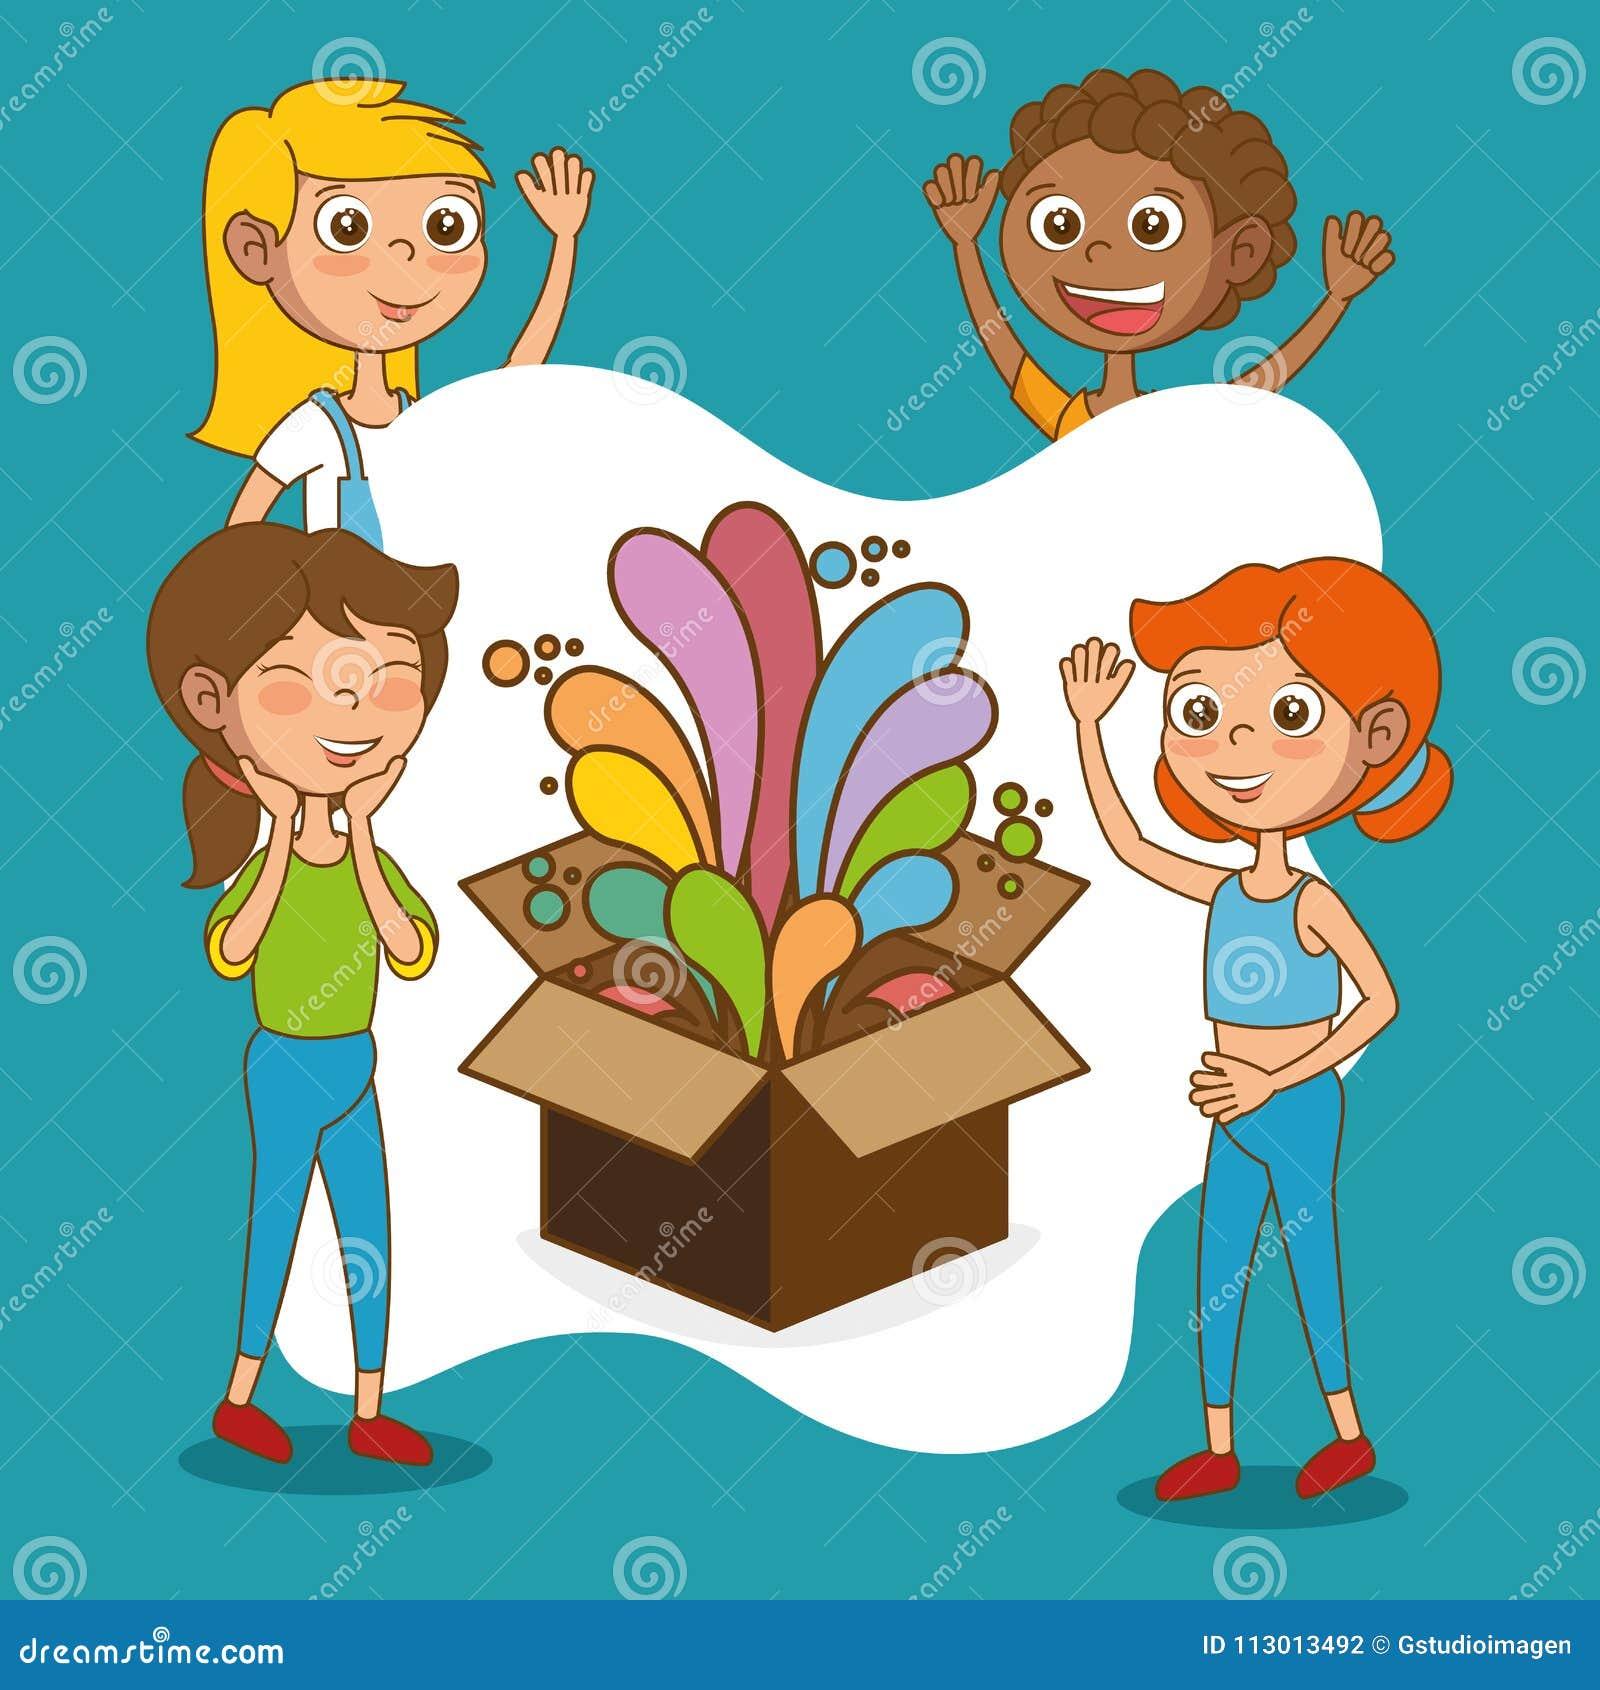 Kids With Creative Big Idea Stock Vector - Illustration of idea ...